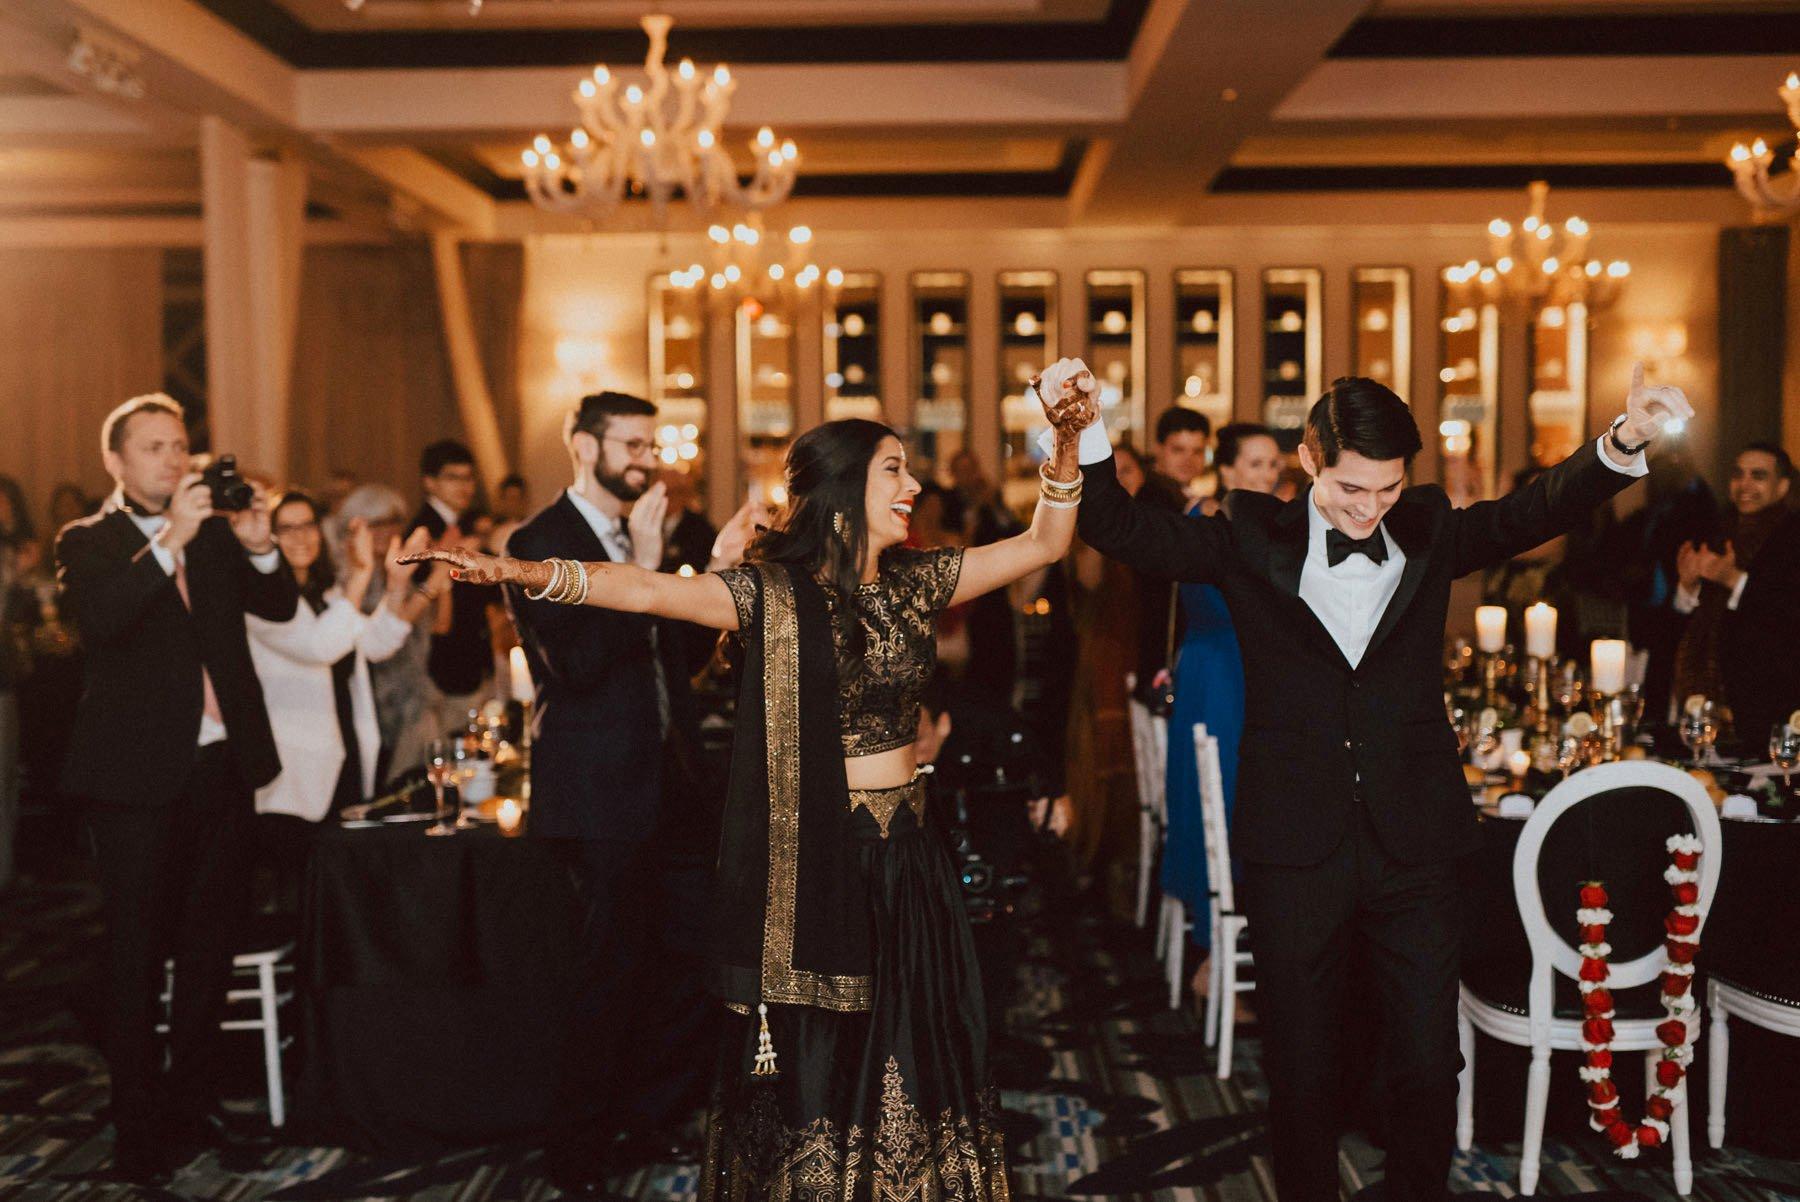 vie-philadelphia-indian-wedding-103.jpg